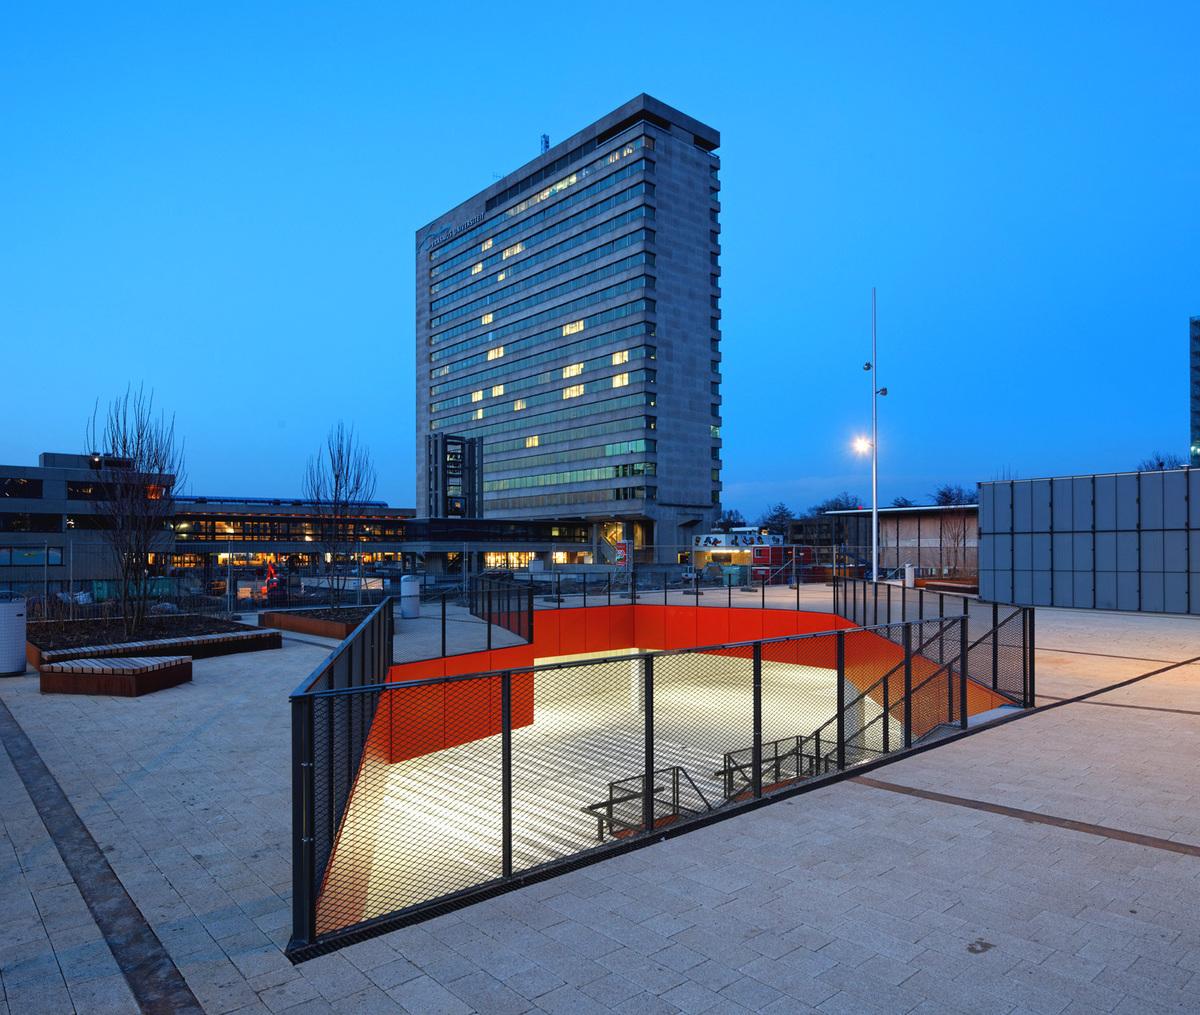 University Of Amsterdam Dorms: Erasmus University Campus Masterplan